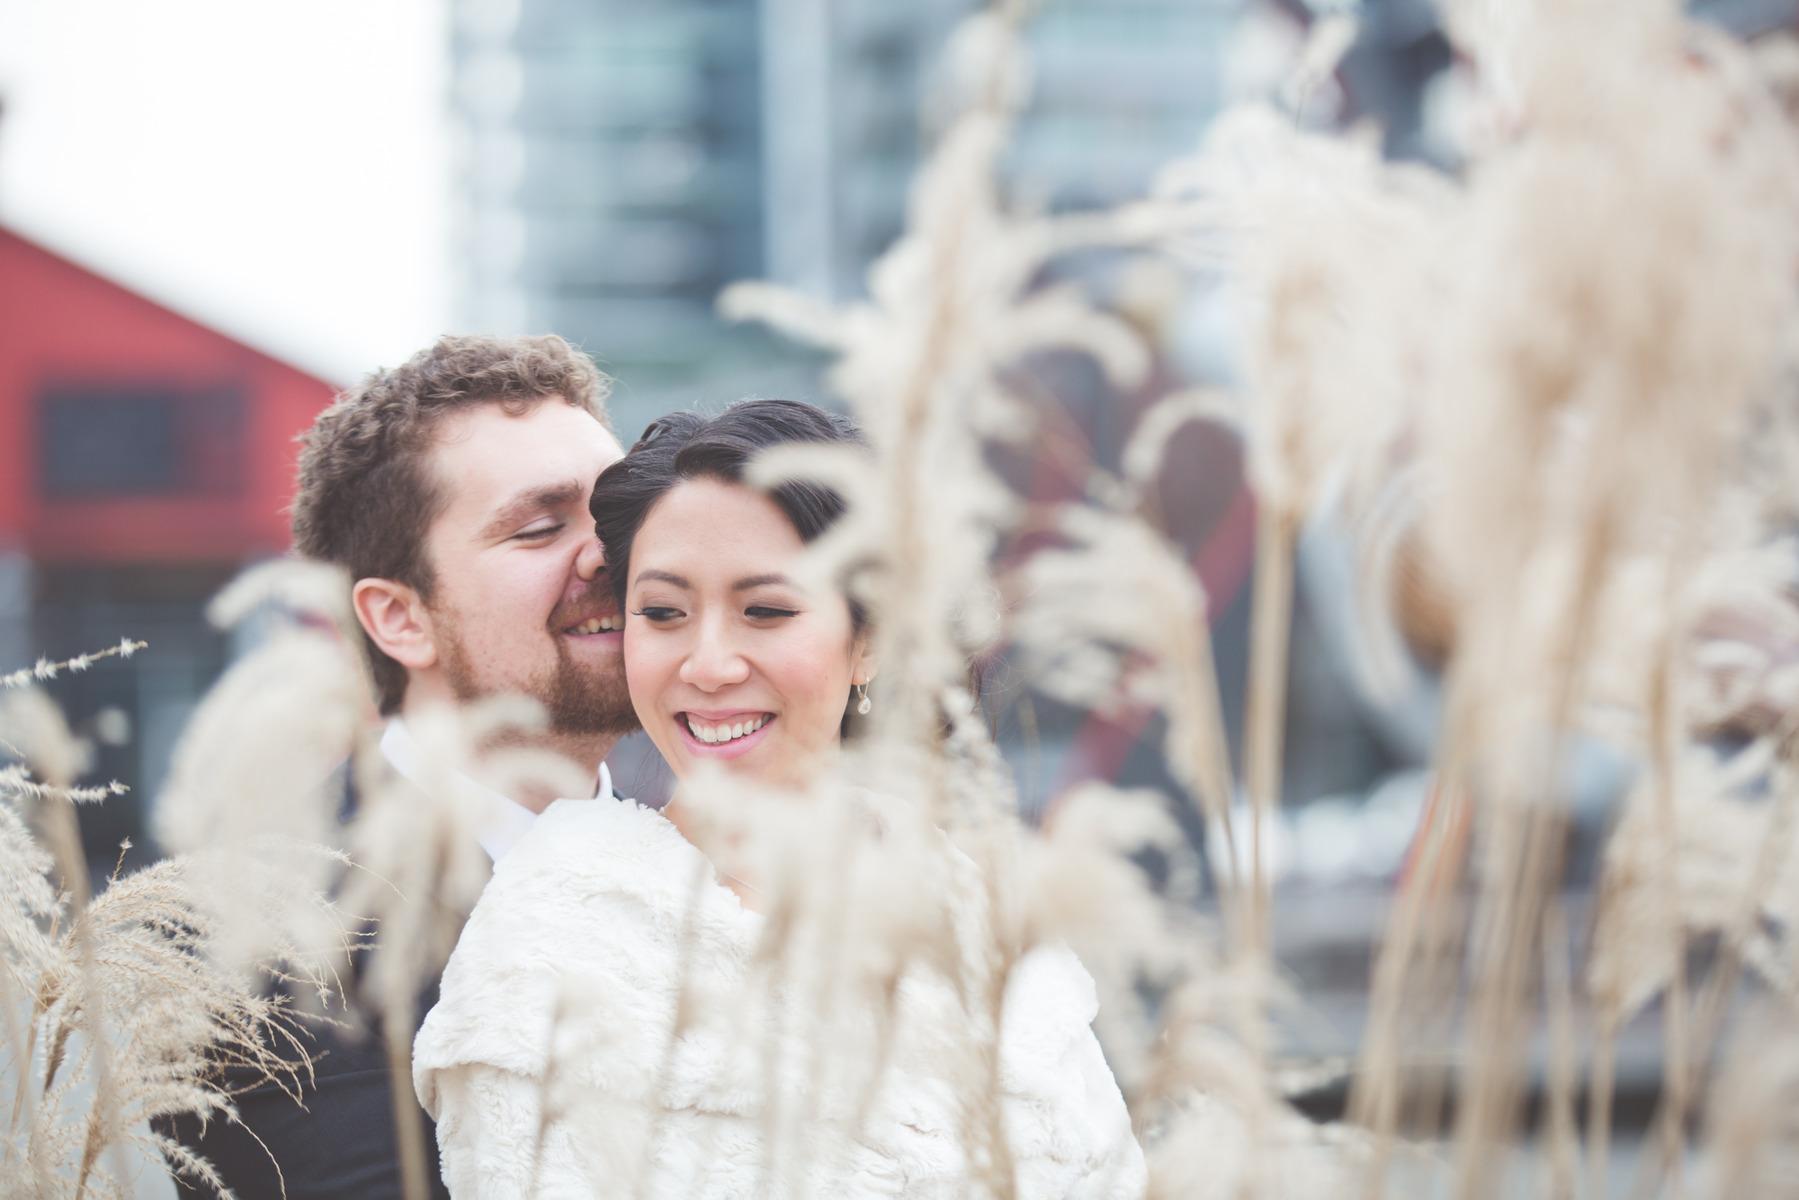 Tianna-Tran-Vancouver-Wedding-Makeup-Artist-Bridal-030.jpg